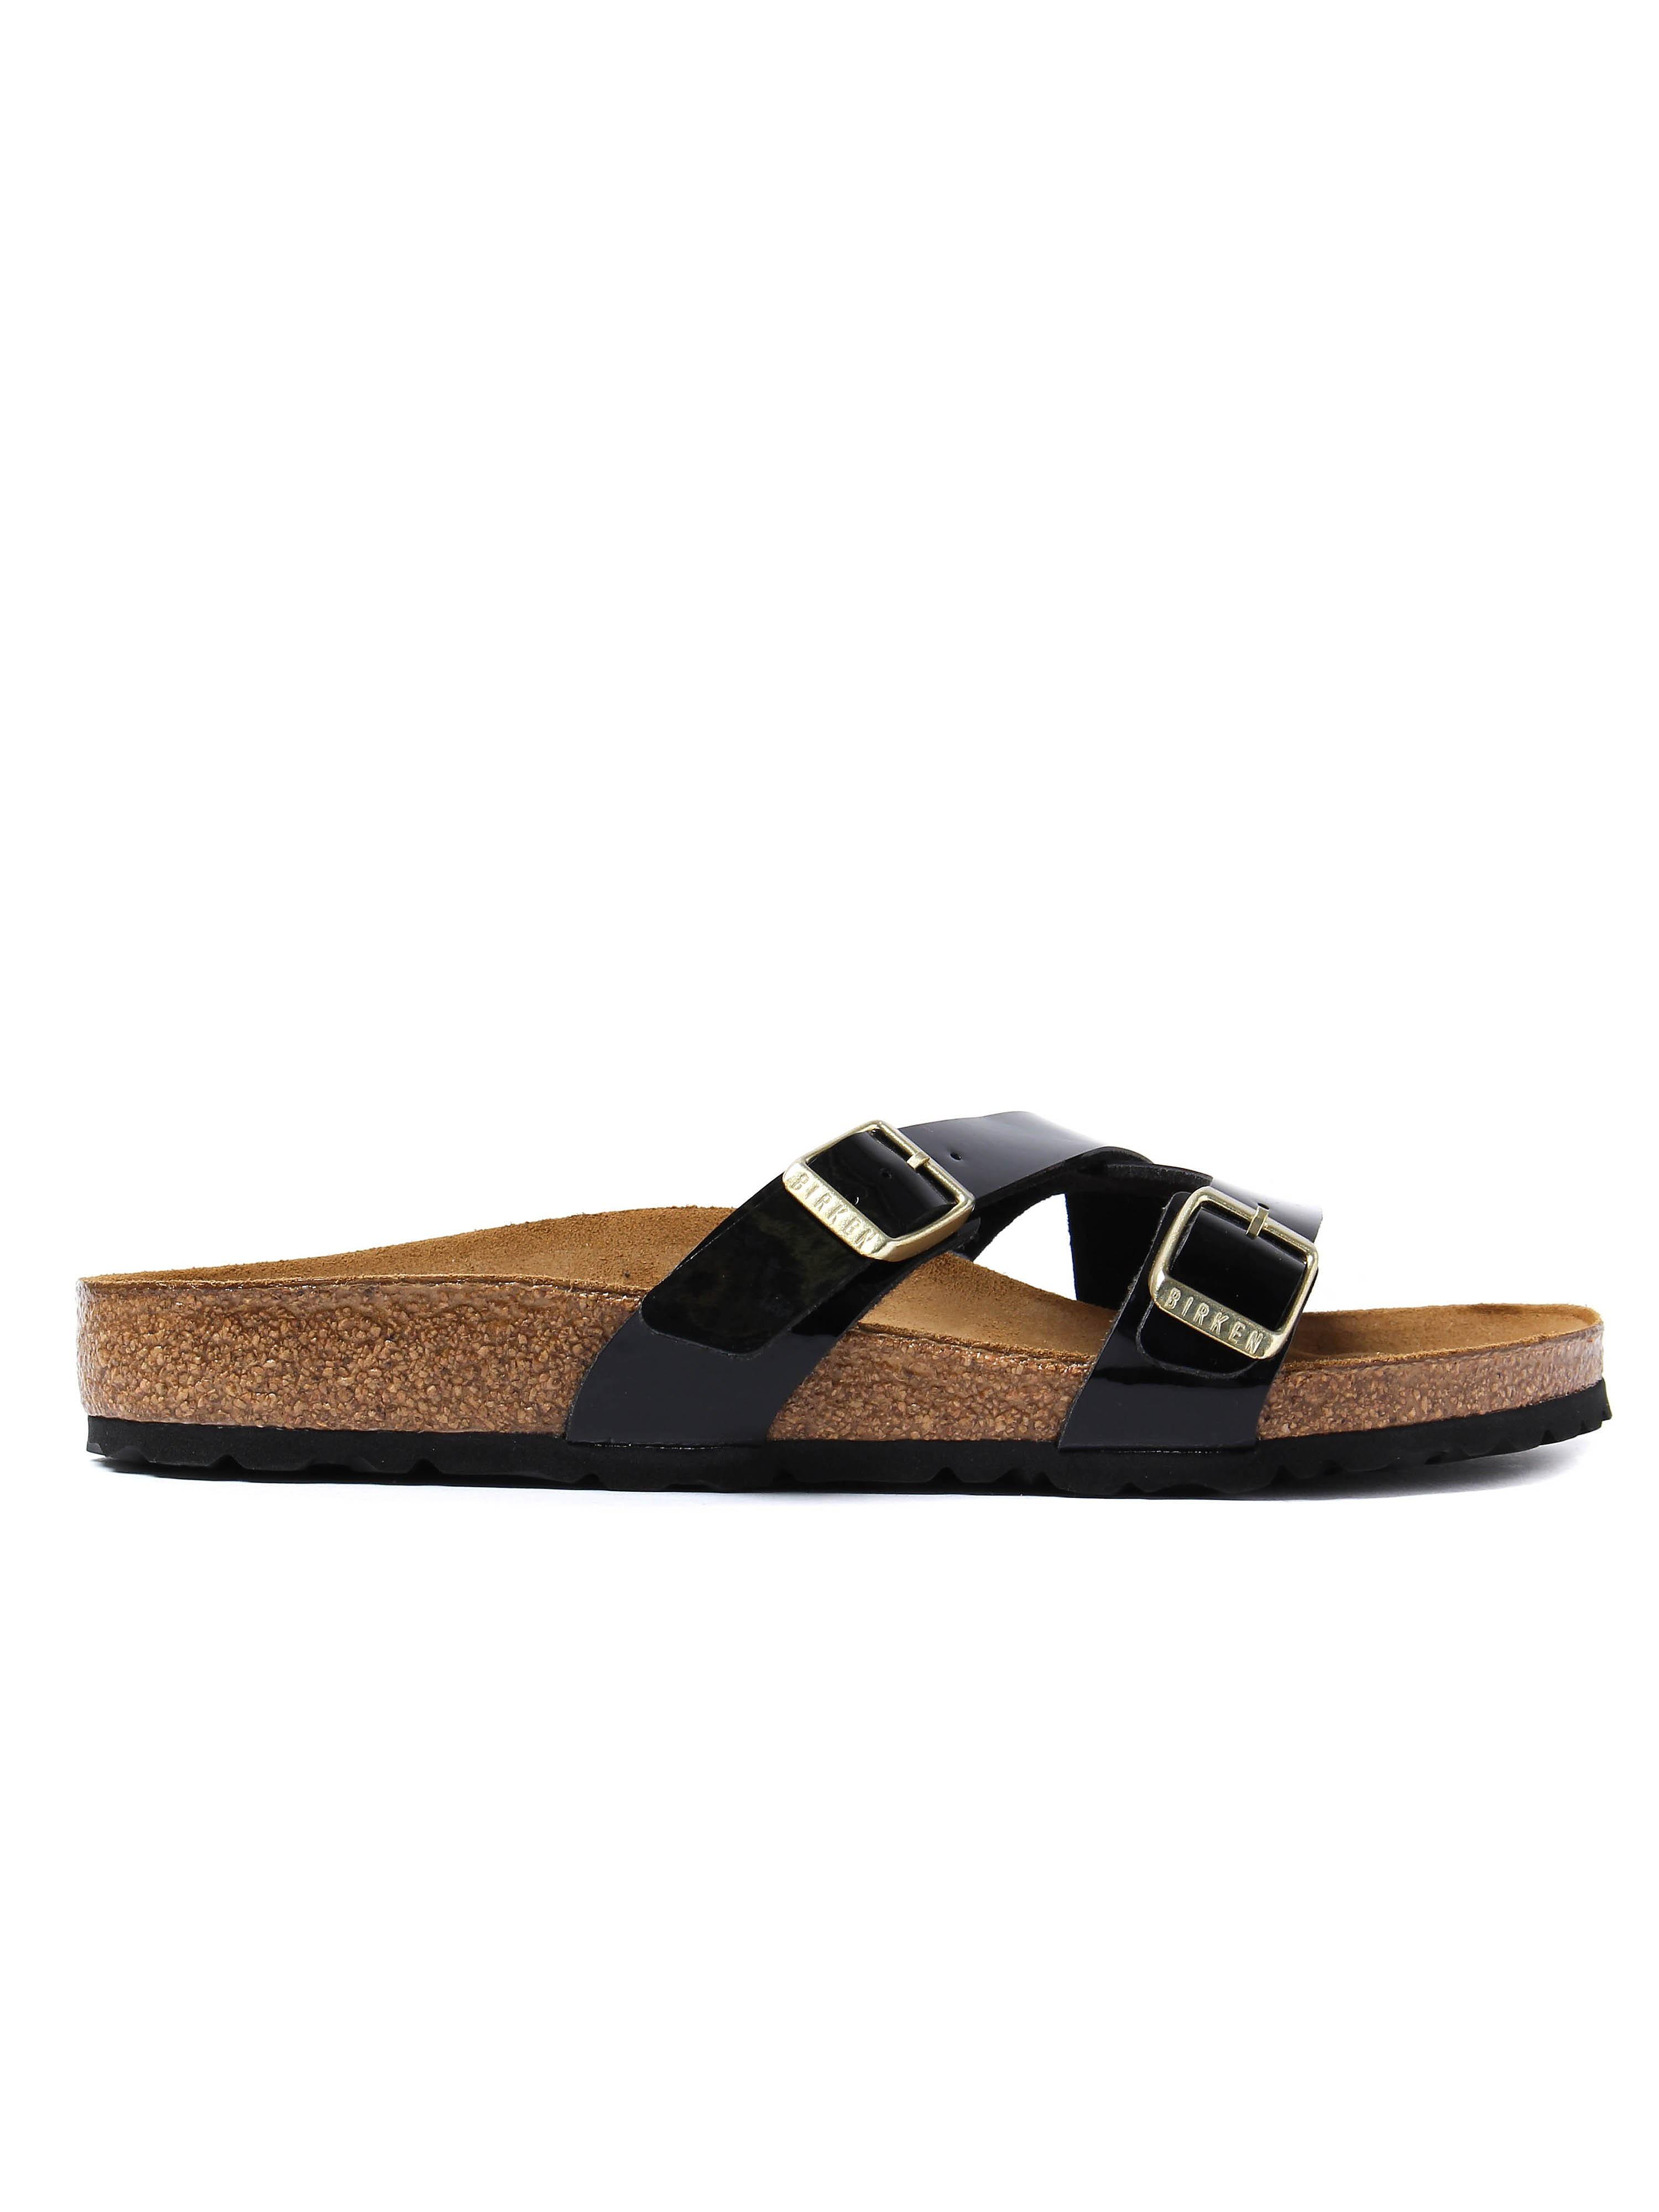 Birkenstock Women's Yao Balance Regular Fit Sandals - Black Patent Leather